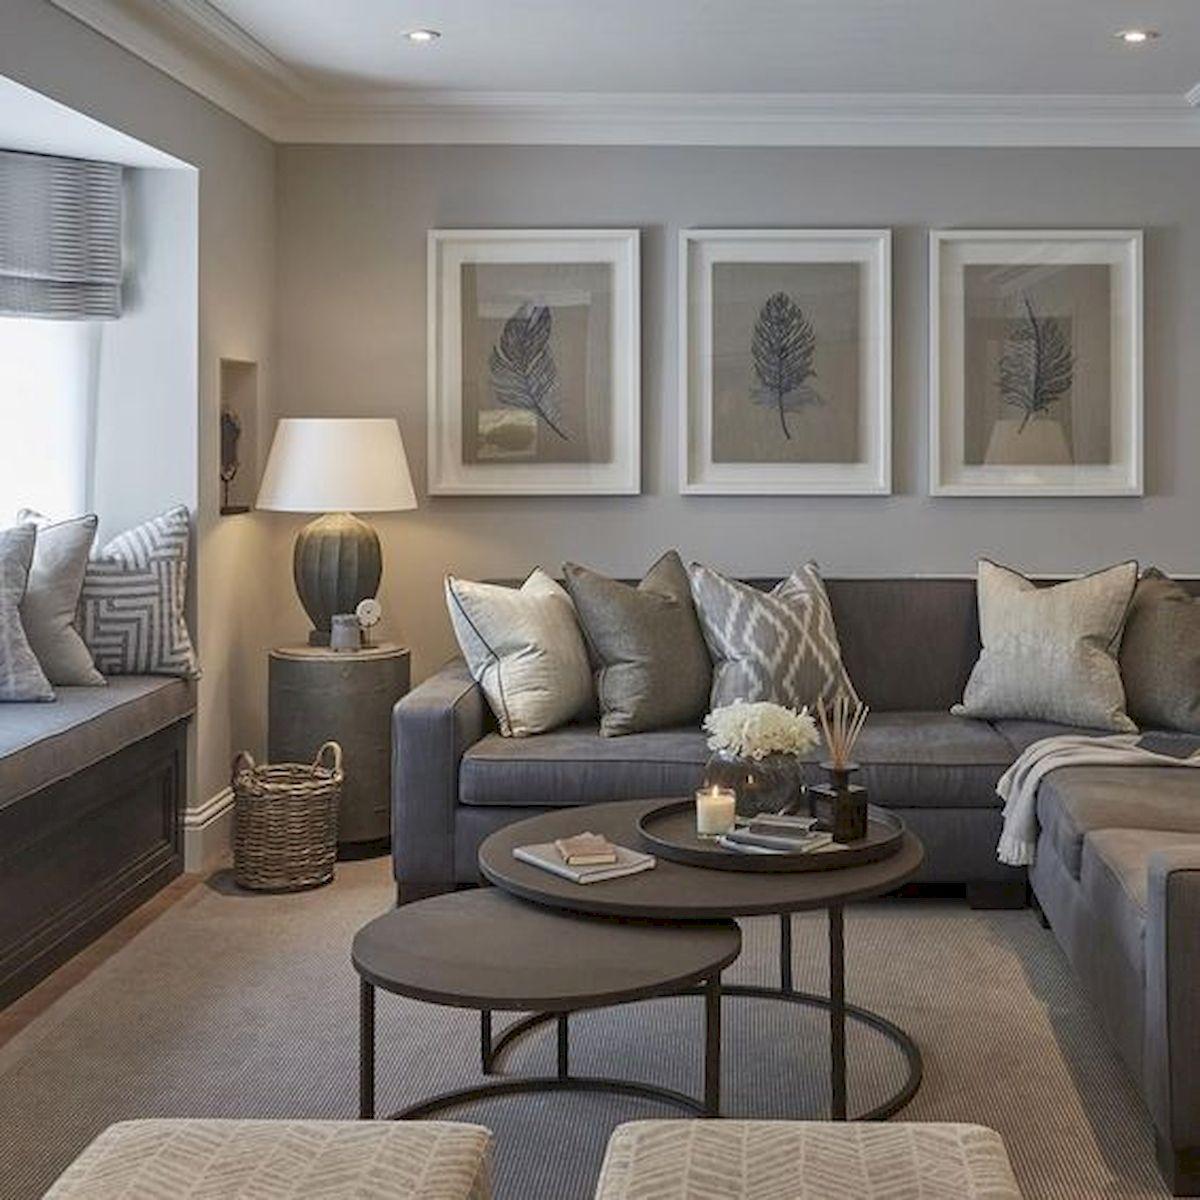 50 Gorgeous Living Room Decor and Design Ideas (2)